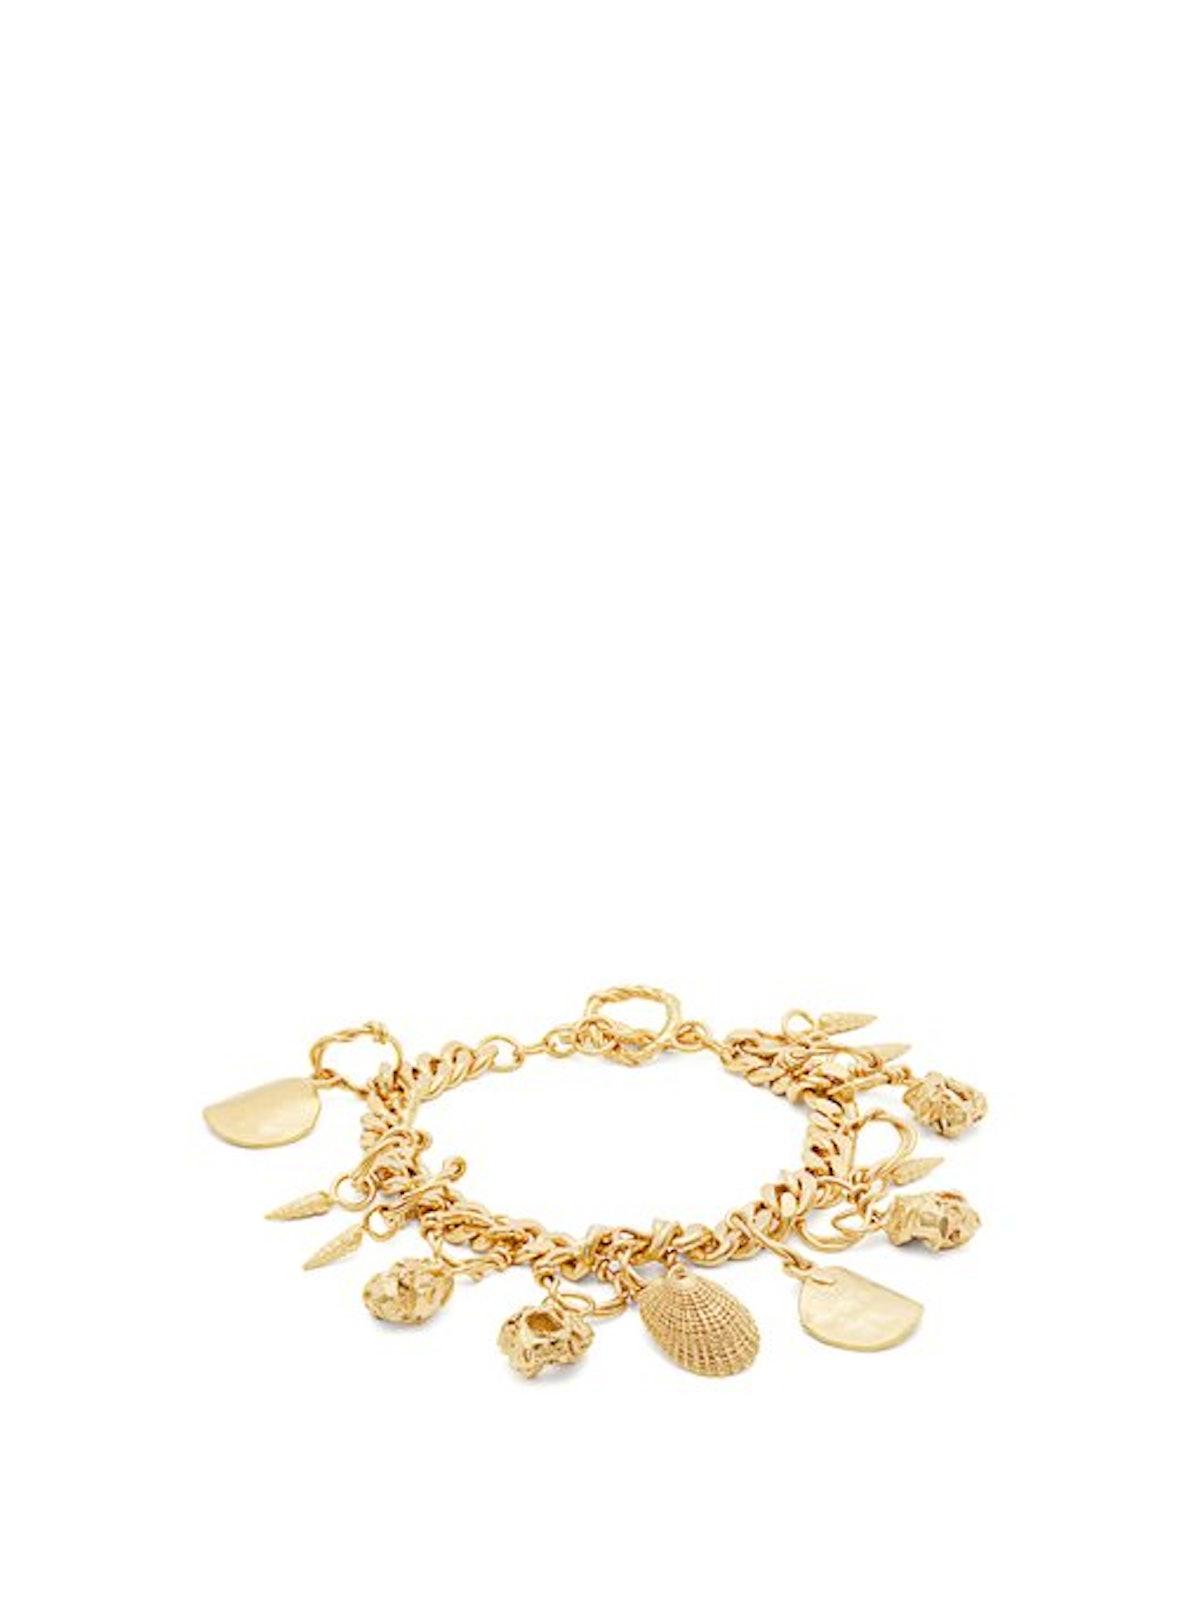 Orit Elhanati Katjushka Gold-Plated Charm Bracelet